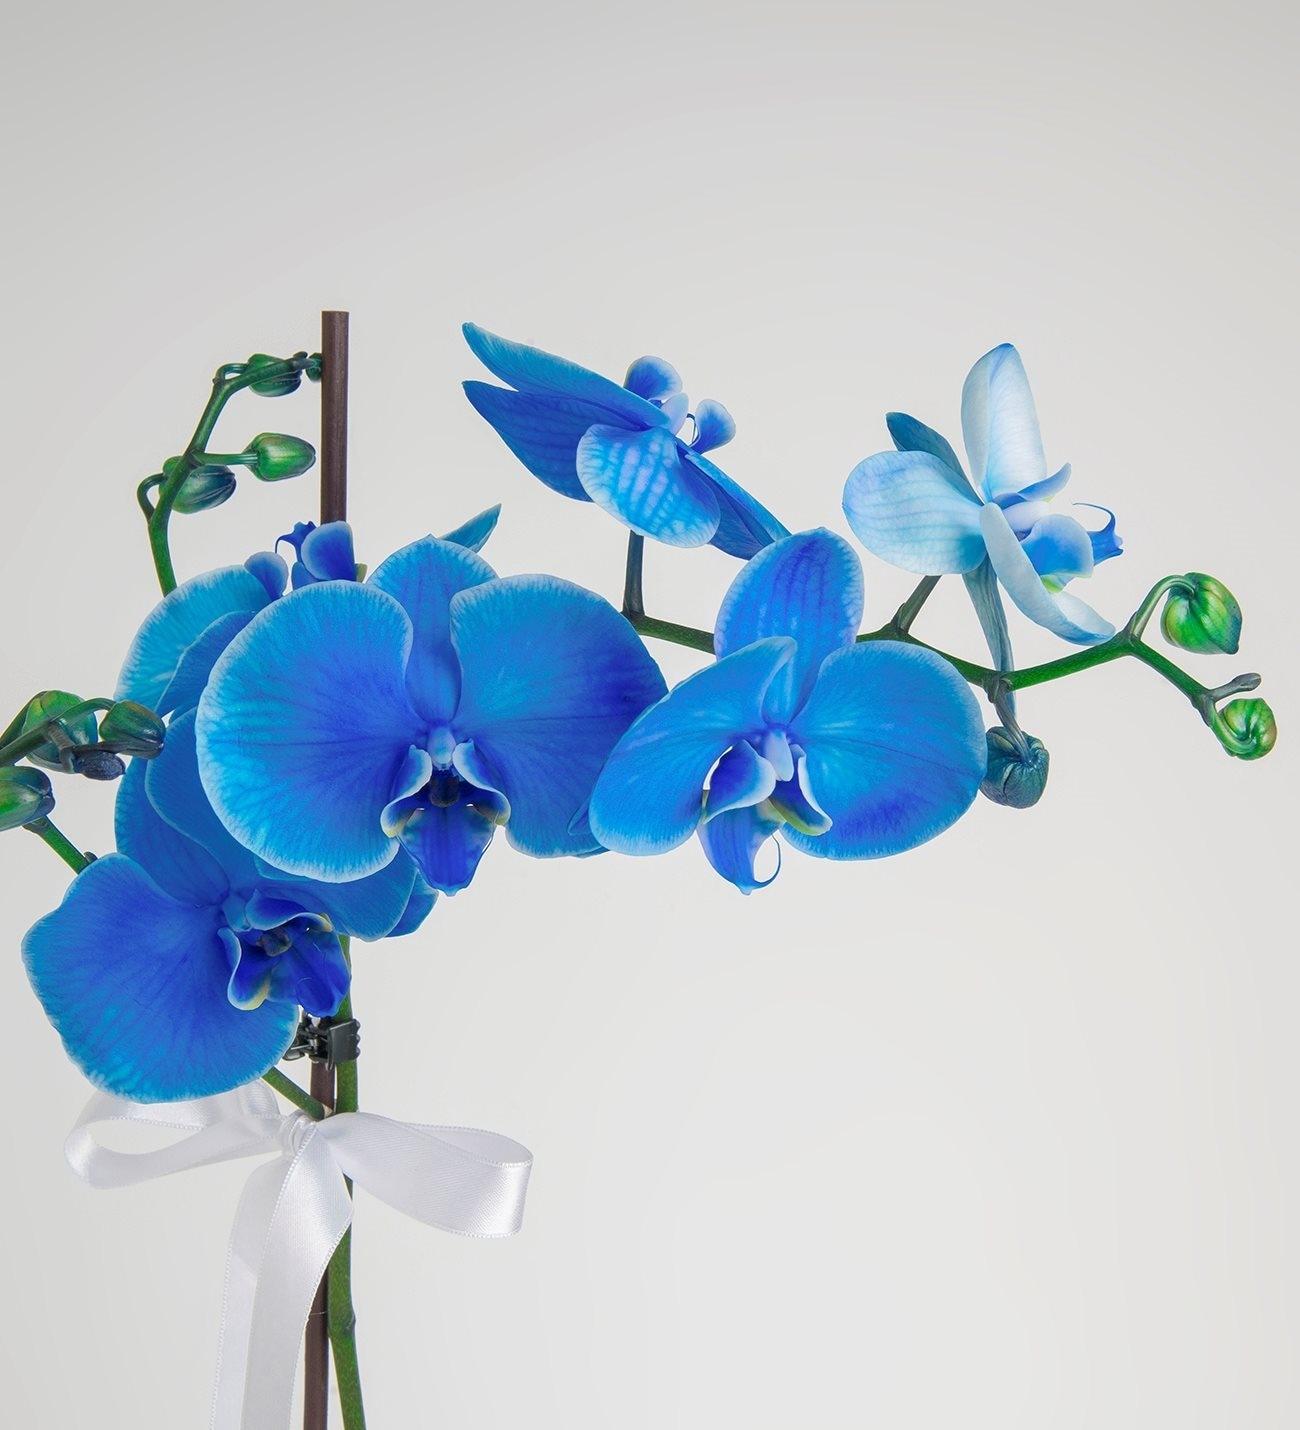 Orquidea Azul En Diseno Minimalista Sobre Maceta Blanca